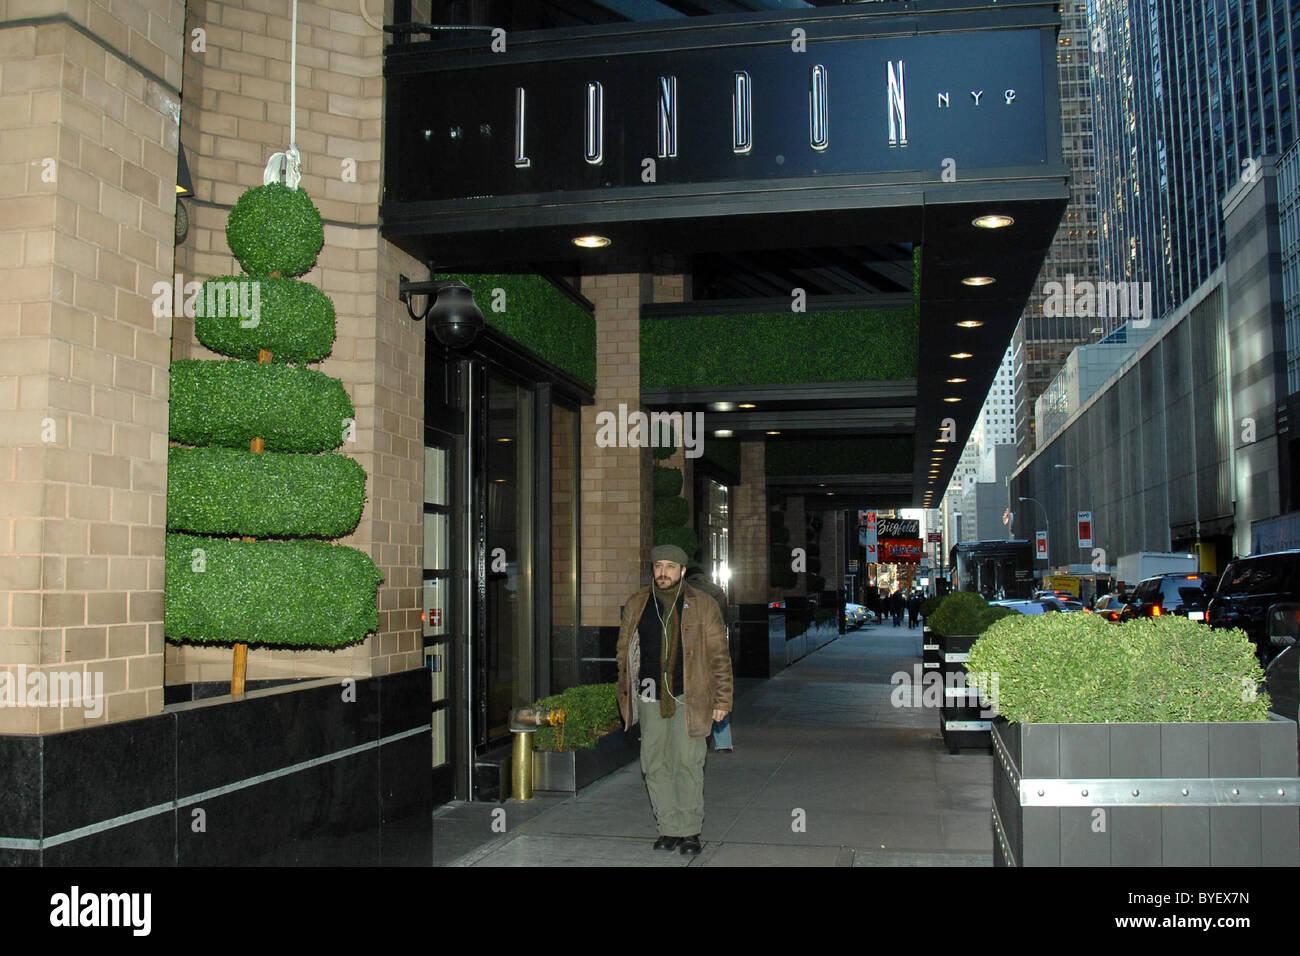 Gordon Ramsay S New Restaurant The London In The London Nyc Hotel Stock Photo Alamy